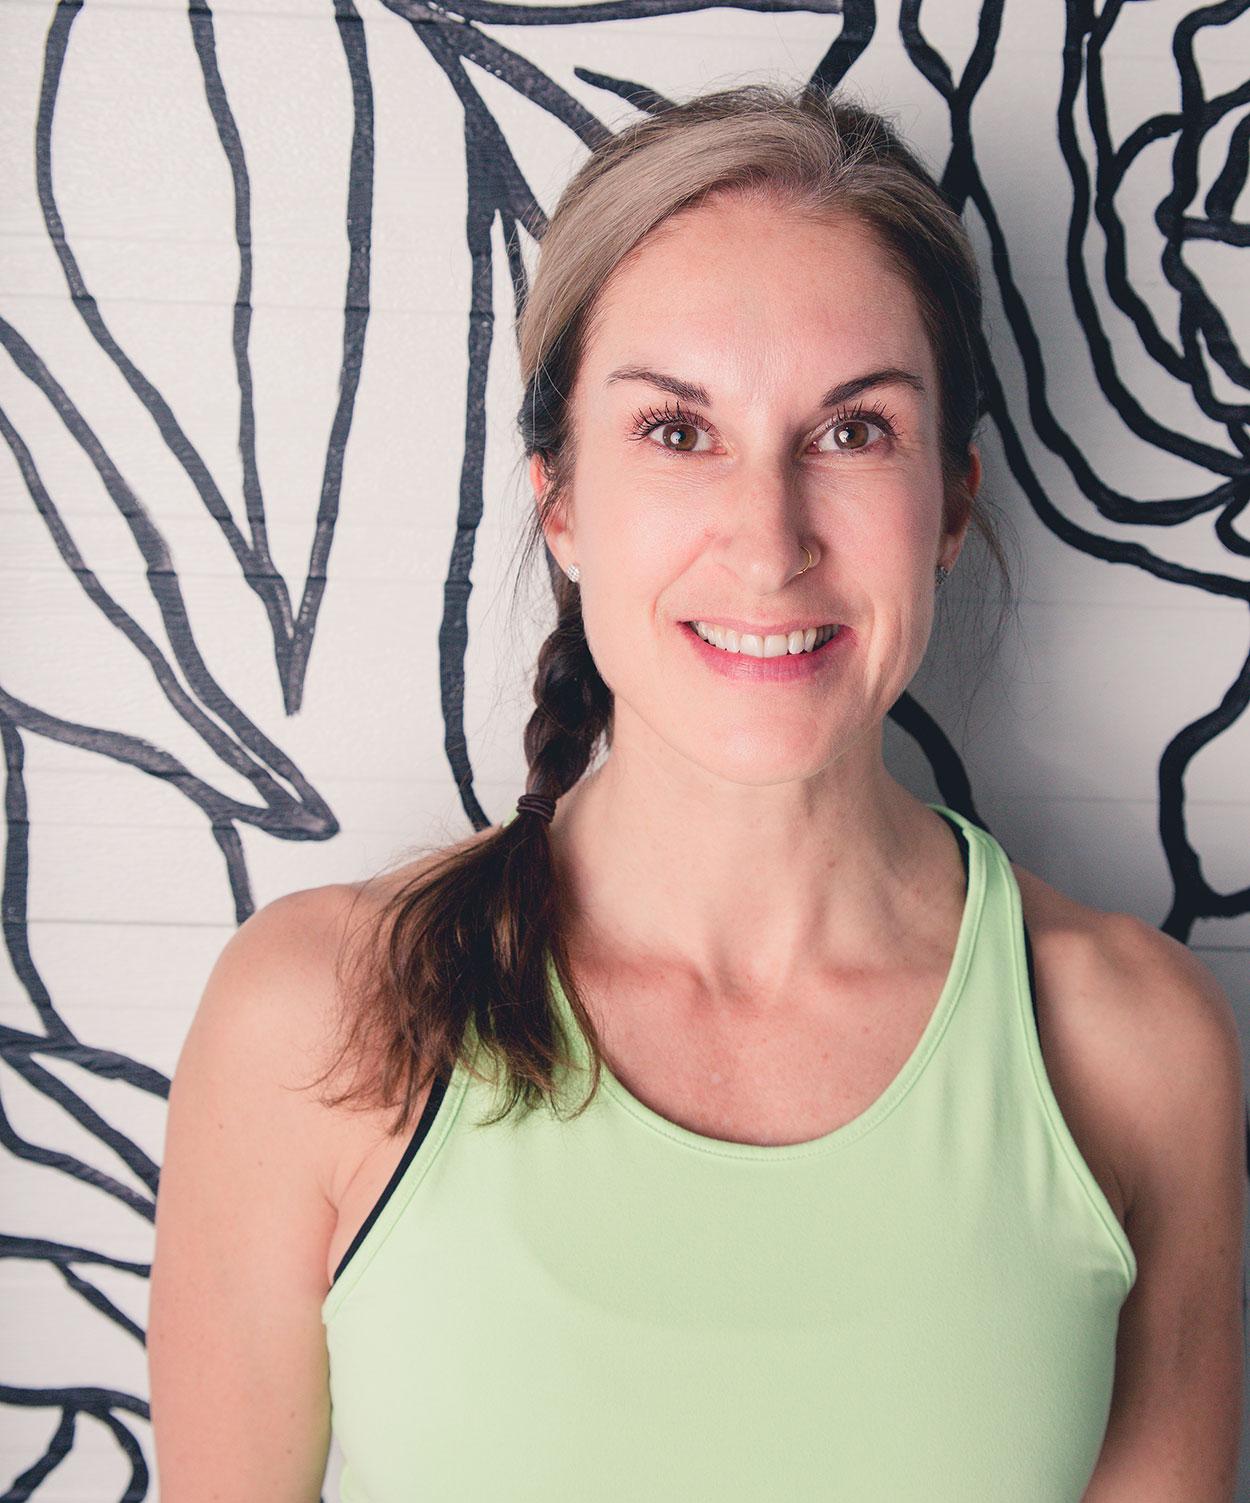 img.nicole-paradis-edmonton-fitness-trainer